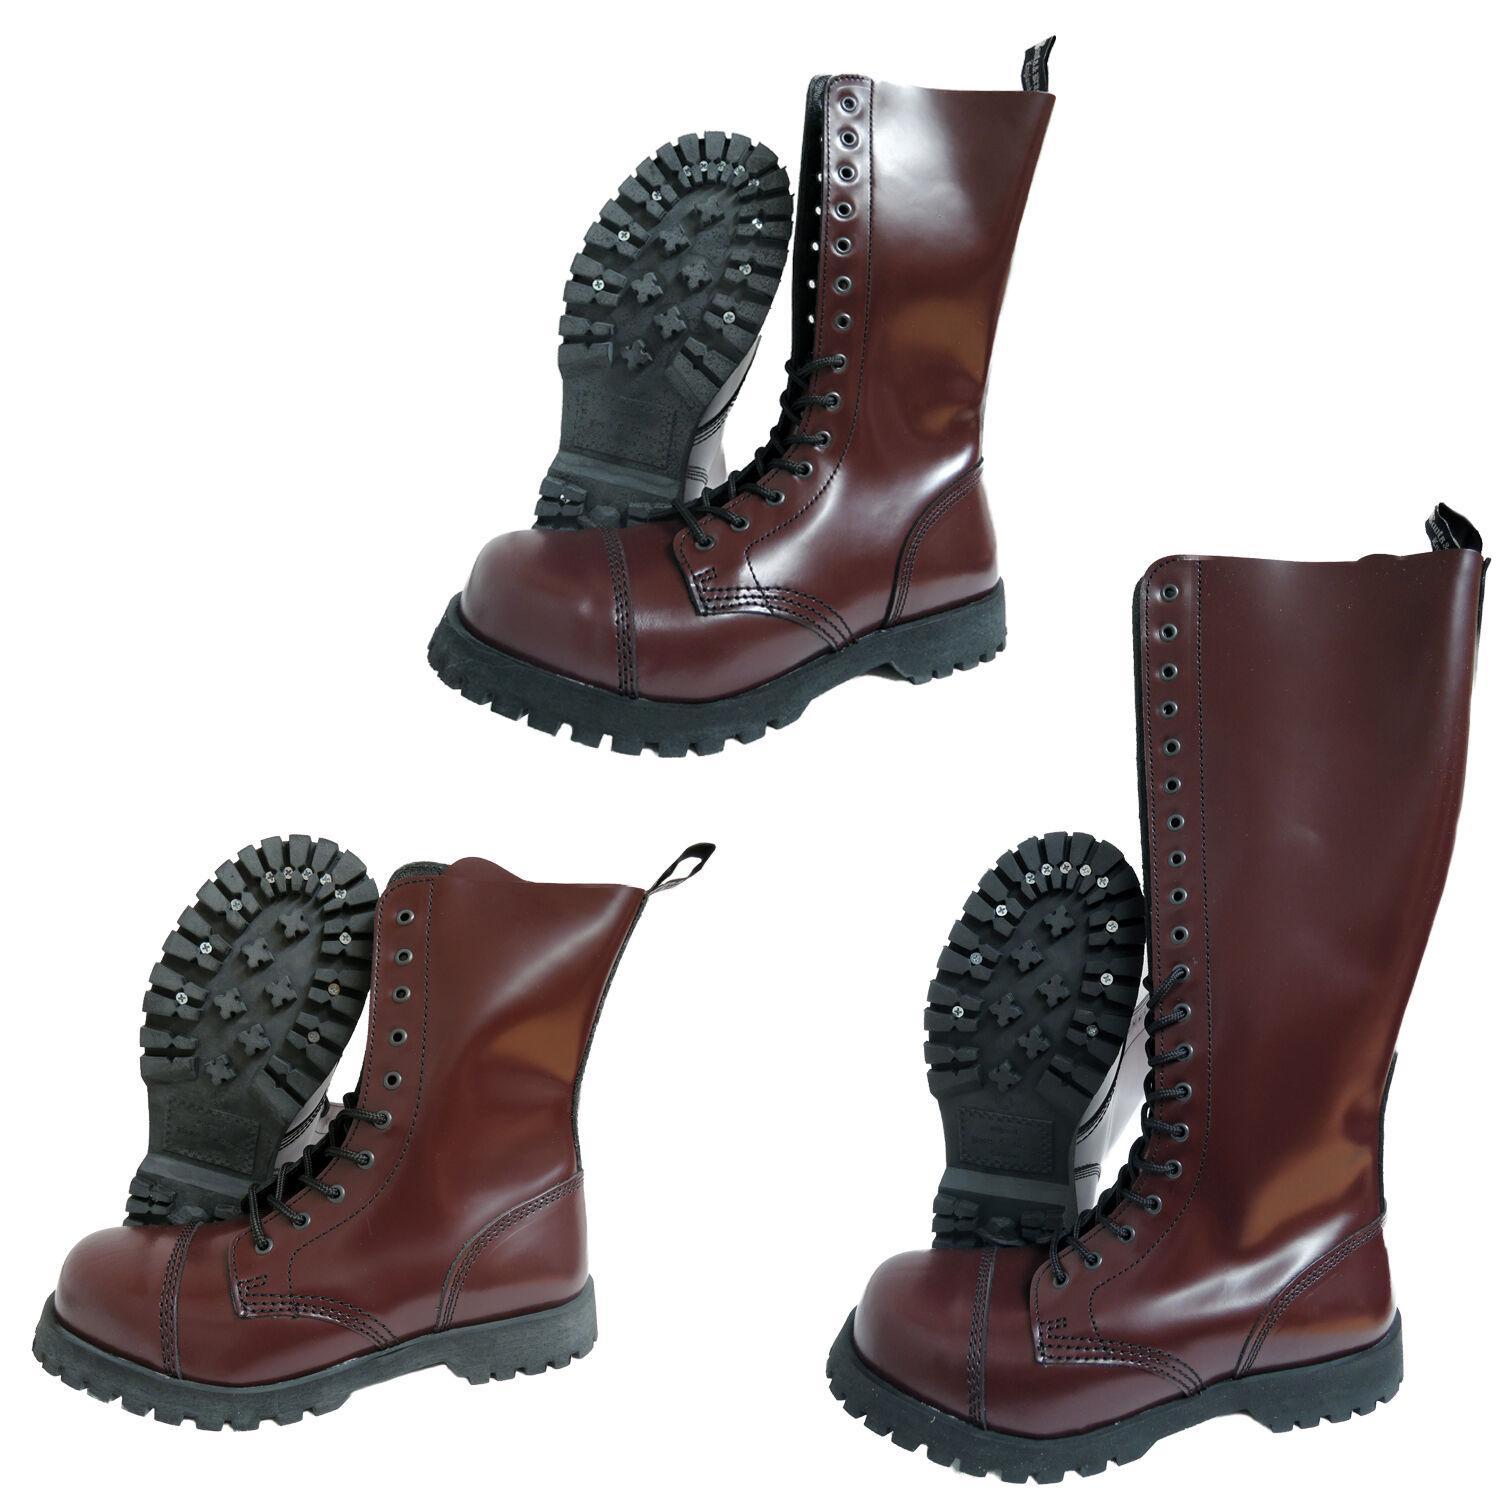 Boots & Braces Oxblood Bordeaux Rangers 10 14 20 Hole Steel Toe Punk Skinhead Oi